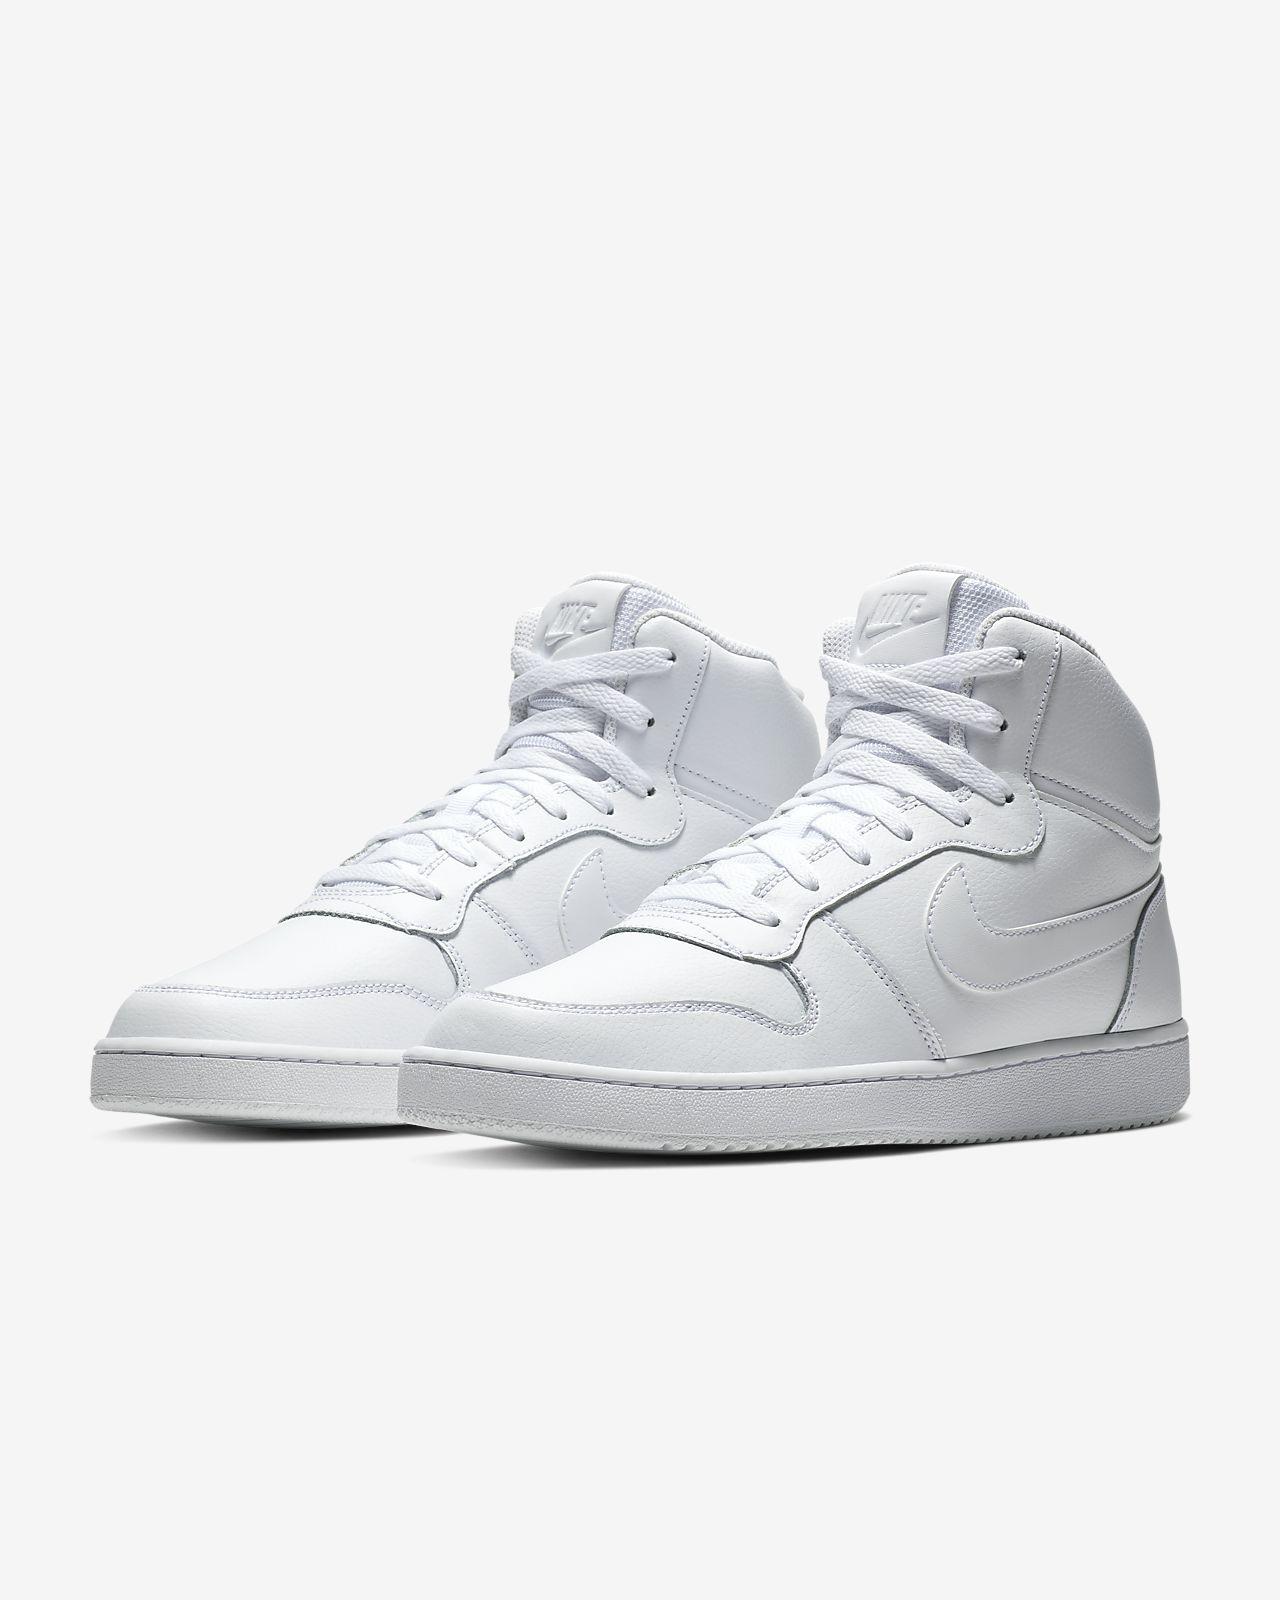 Nike Ebernon Mid Herrenschuh